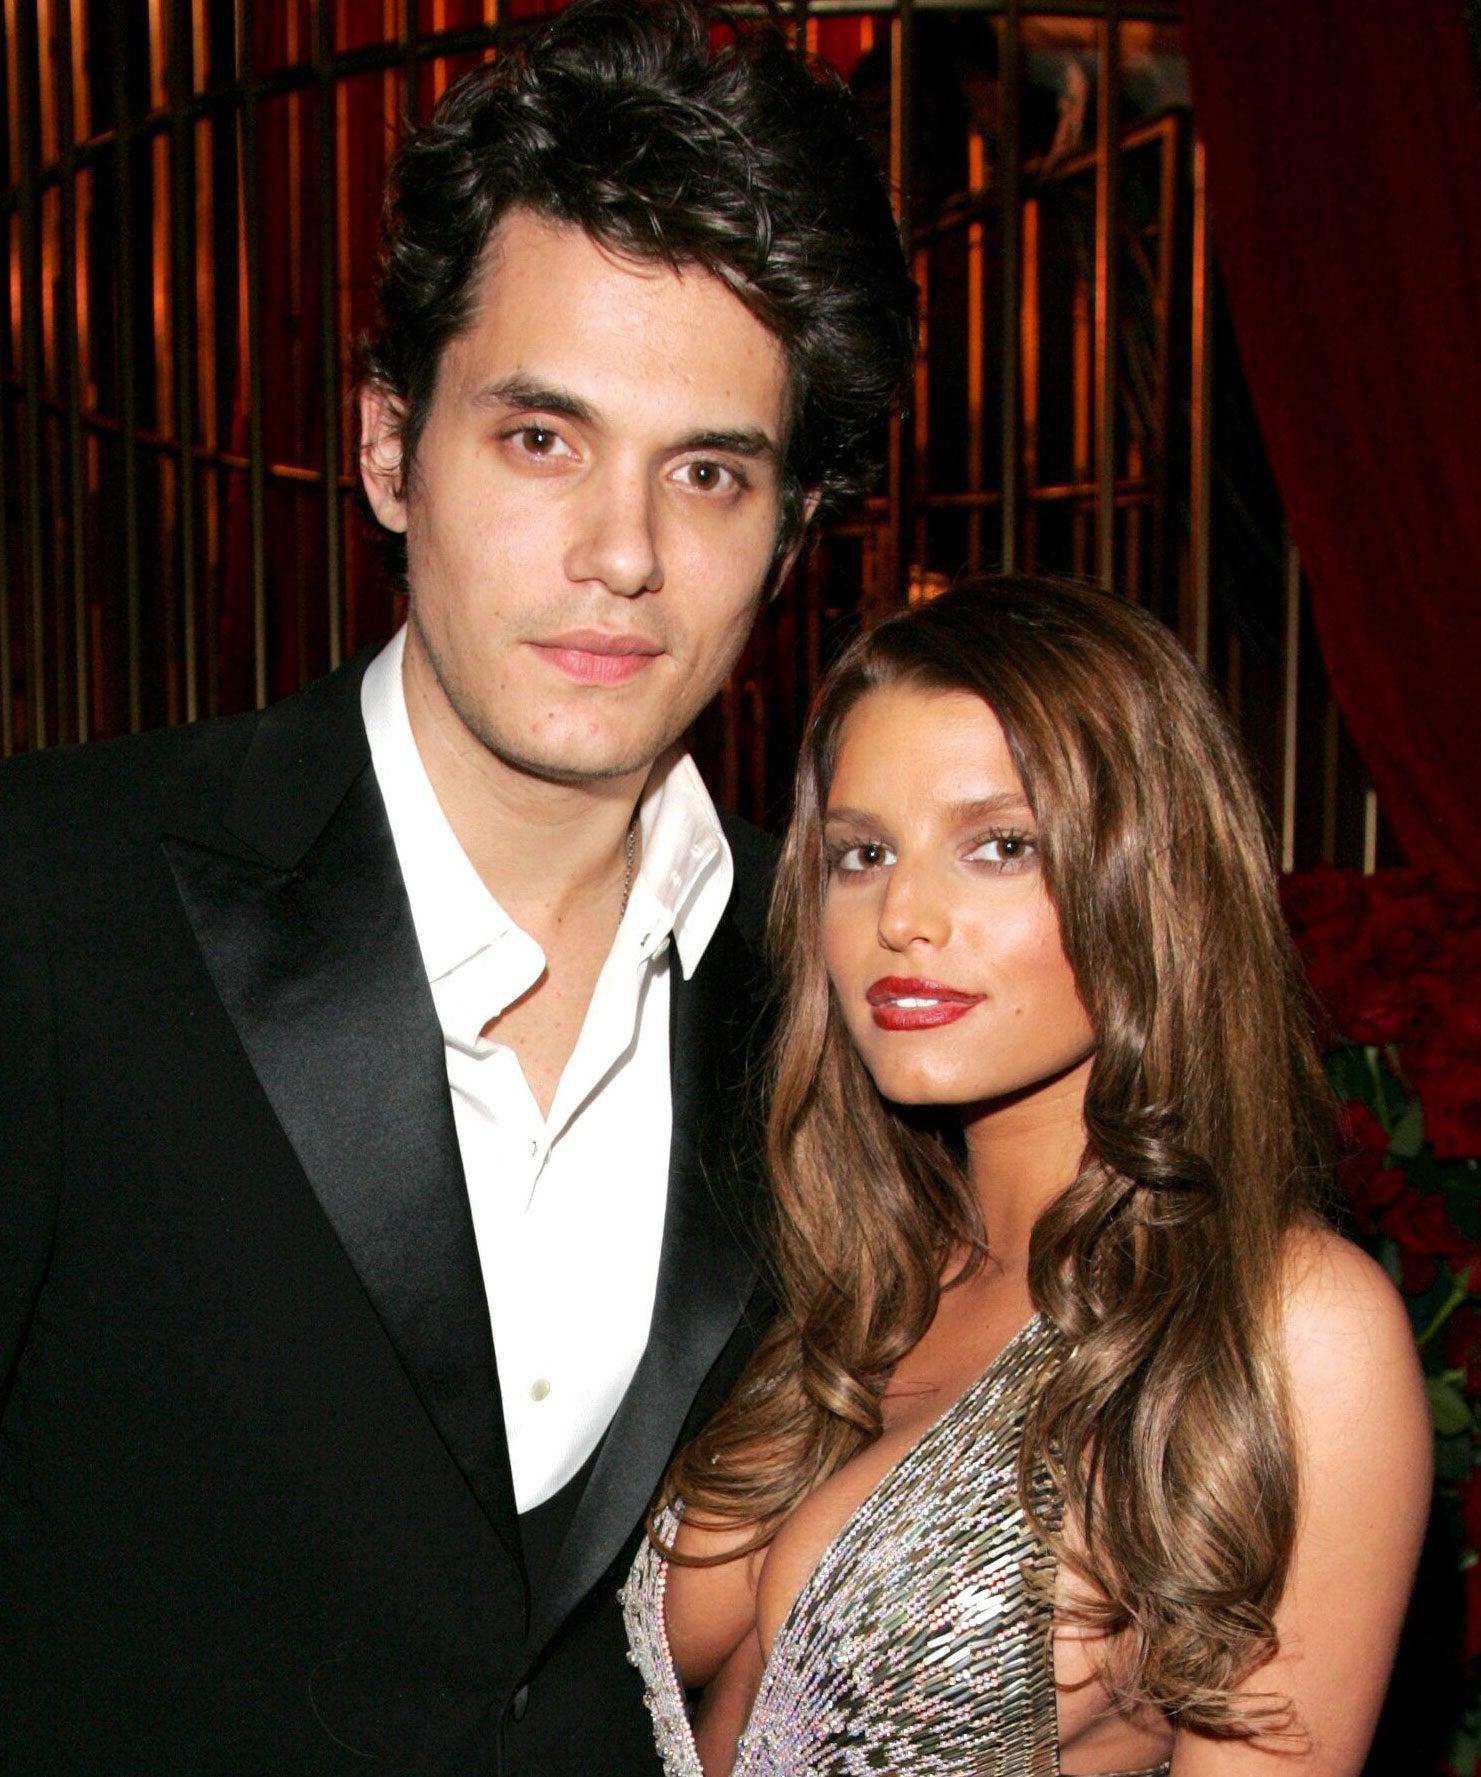 John Mayer teria pegado Perez Hinton quando namorava Jéssica Simpson (Foto: MATT BARON/BEI/SHUTTERSTOCK)